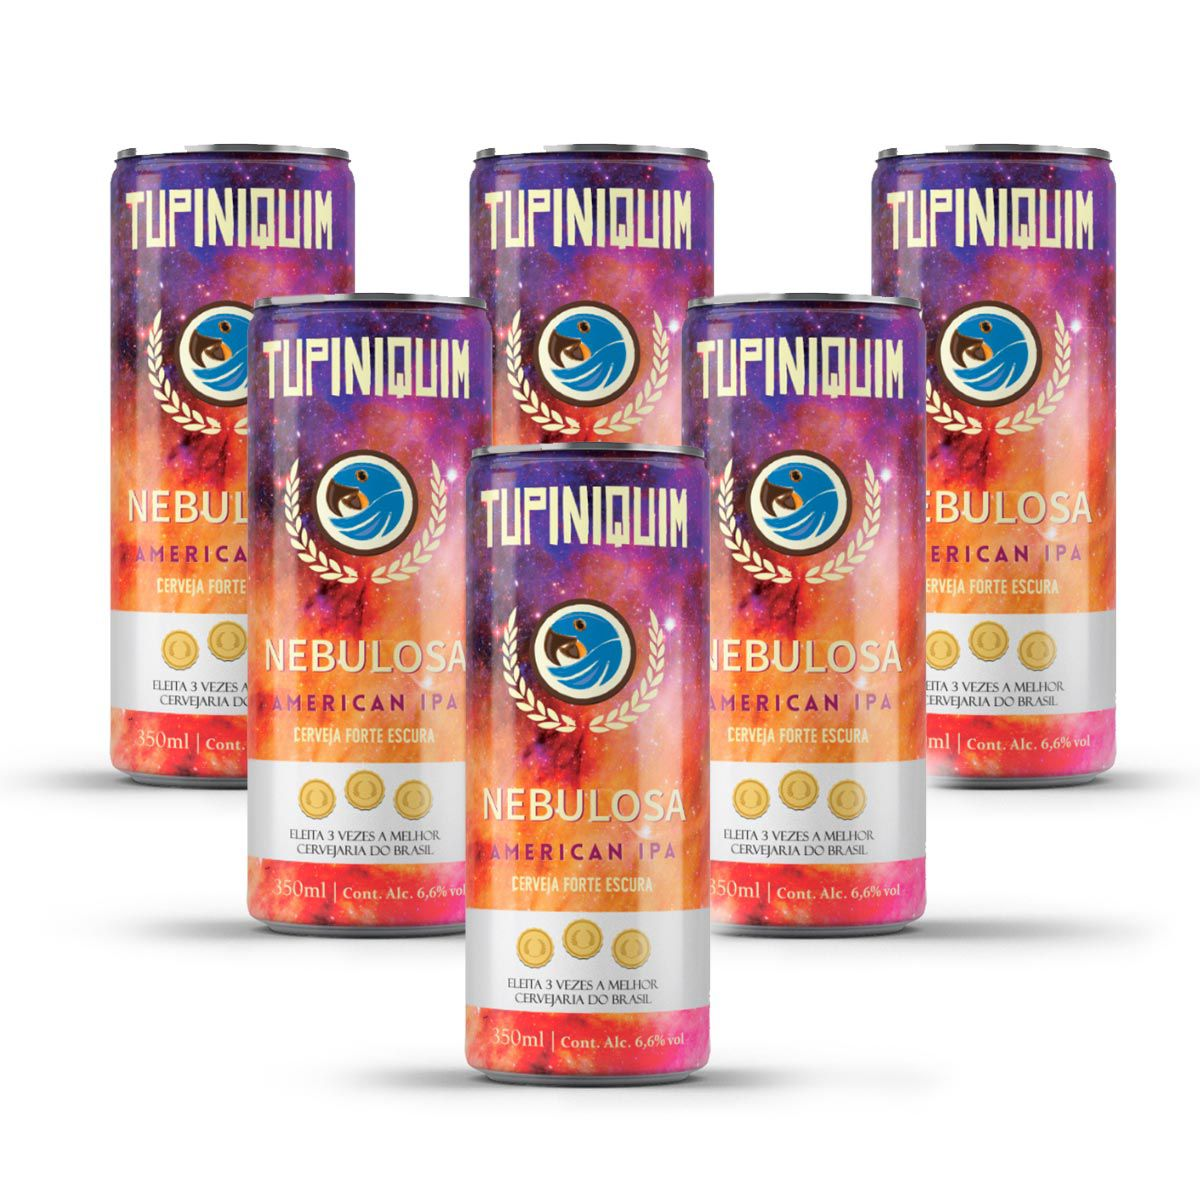 Pack Tupiniquim Nebulosa American IPA 6 cervejas 350ml